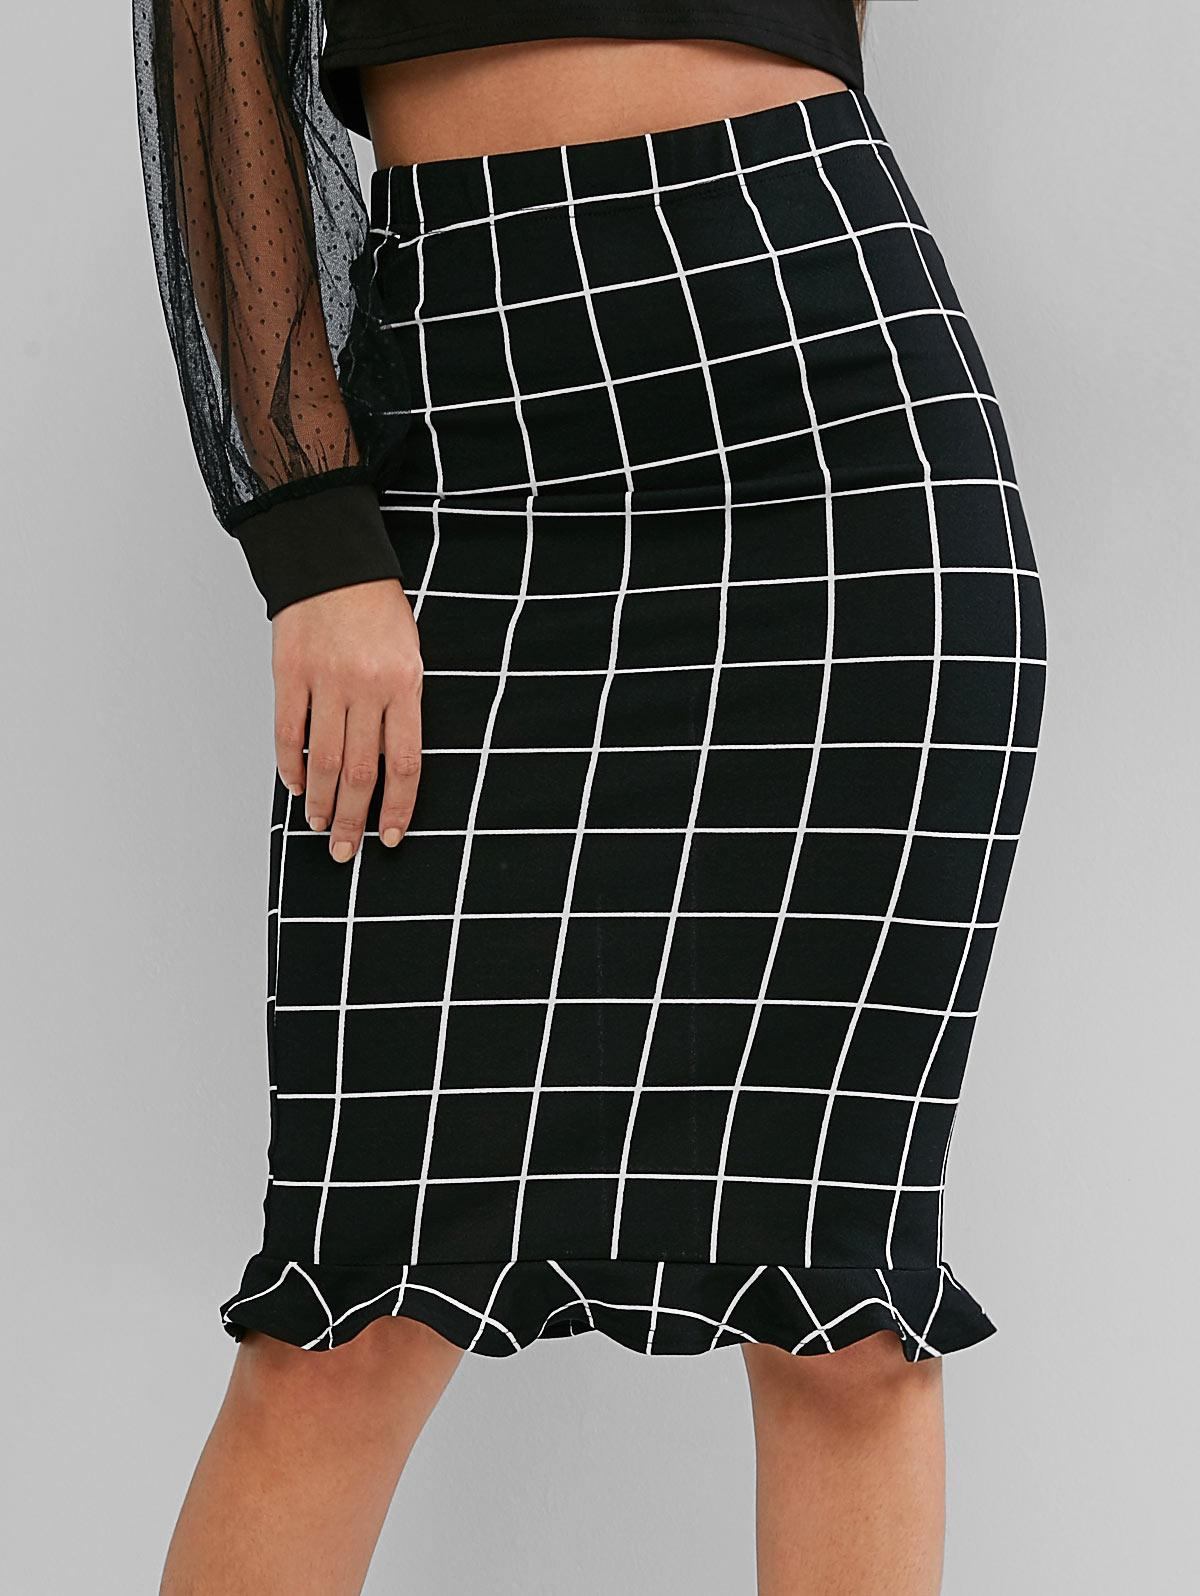 ZAFUL Grid Print High Waisted Ruffle Midi Bodycon Skirt, Black